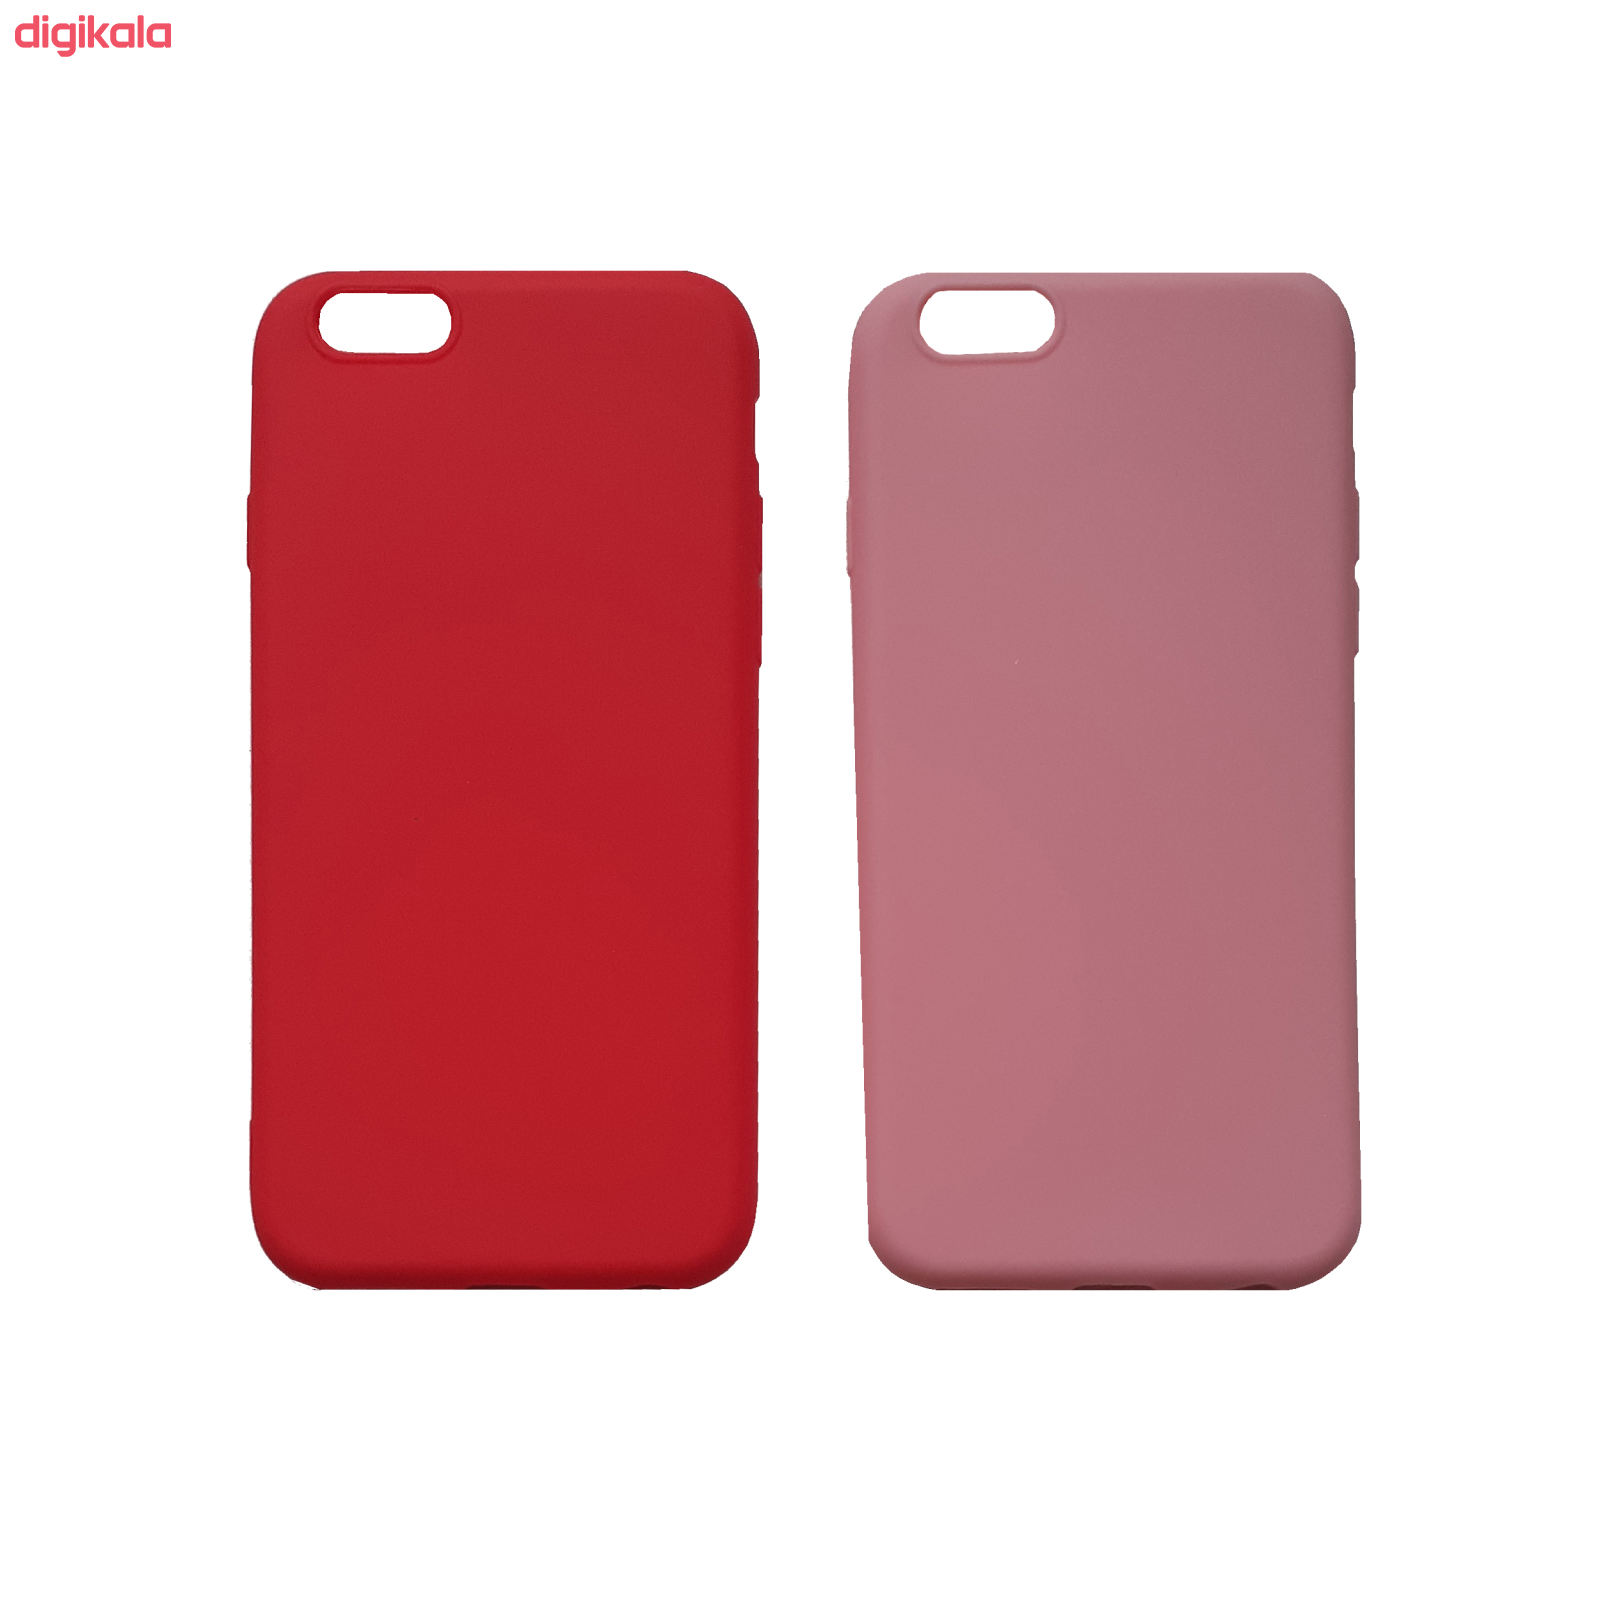 کاور مدل M-6G مناسب برای گوشی موبایل اپل iphone 6/6S main 1 3